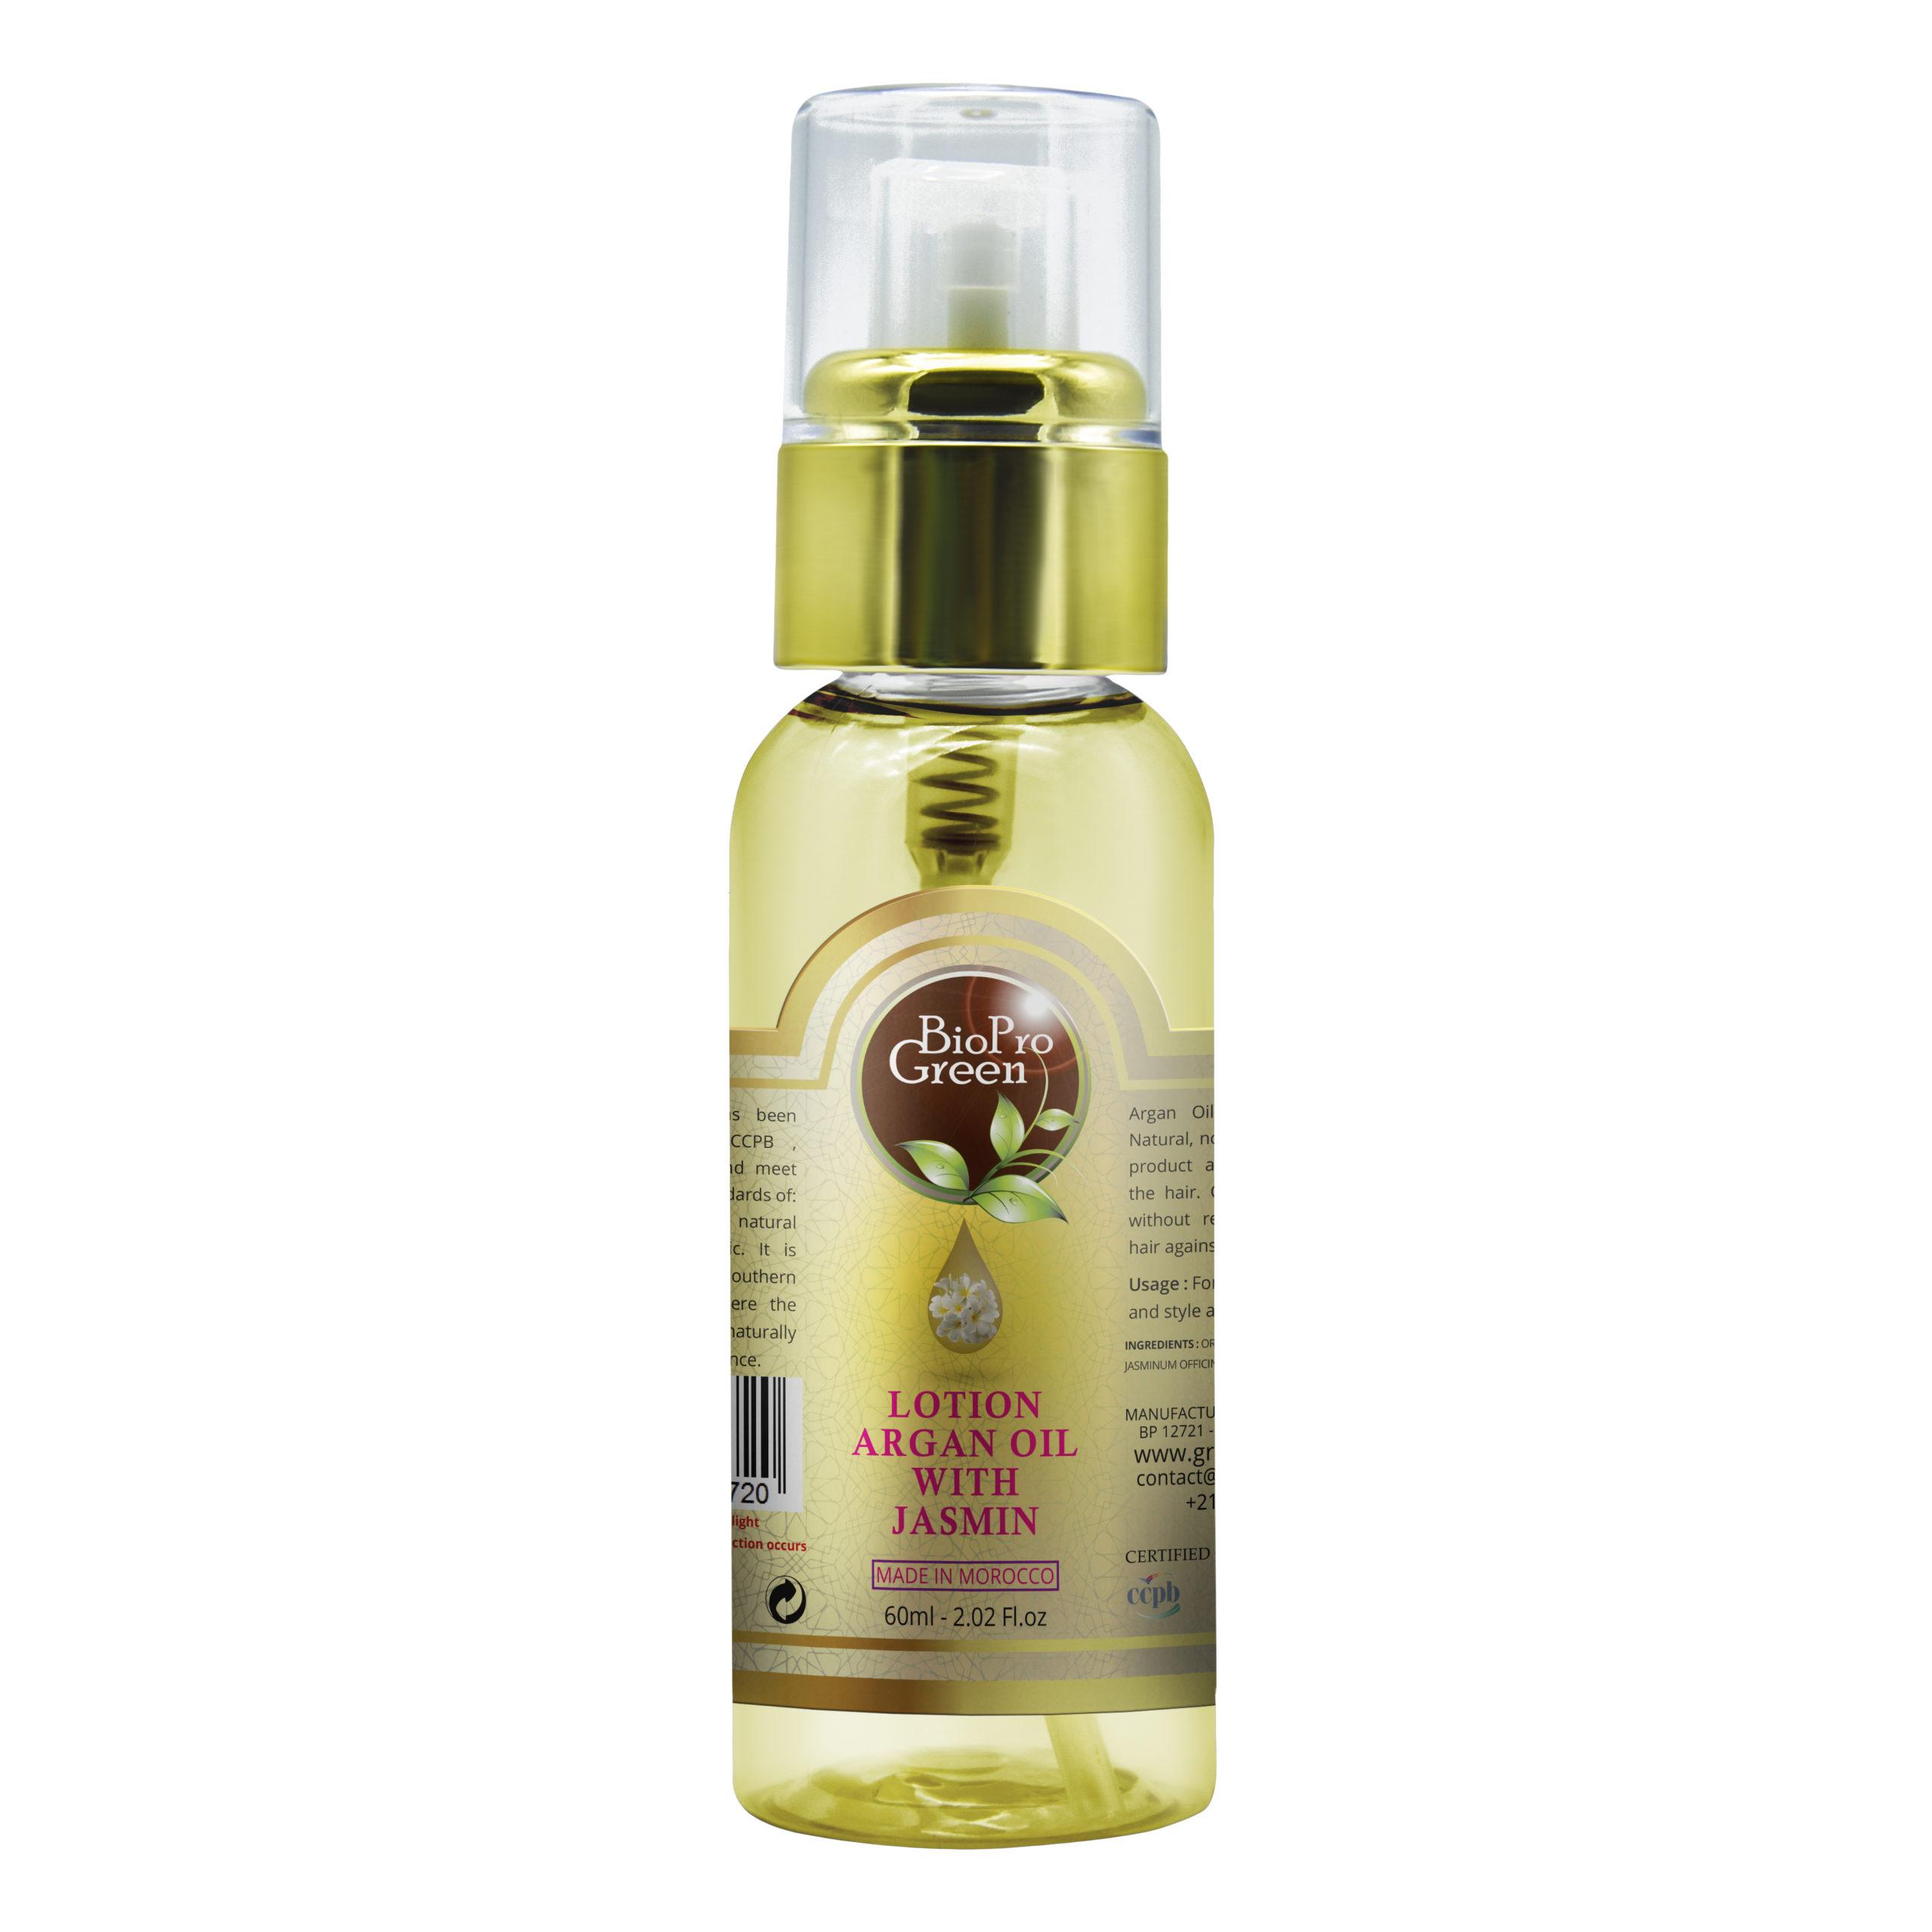 argan oil with flavor